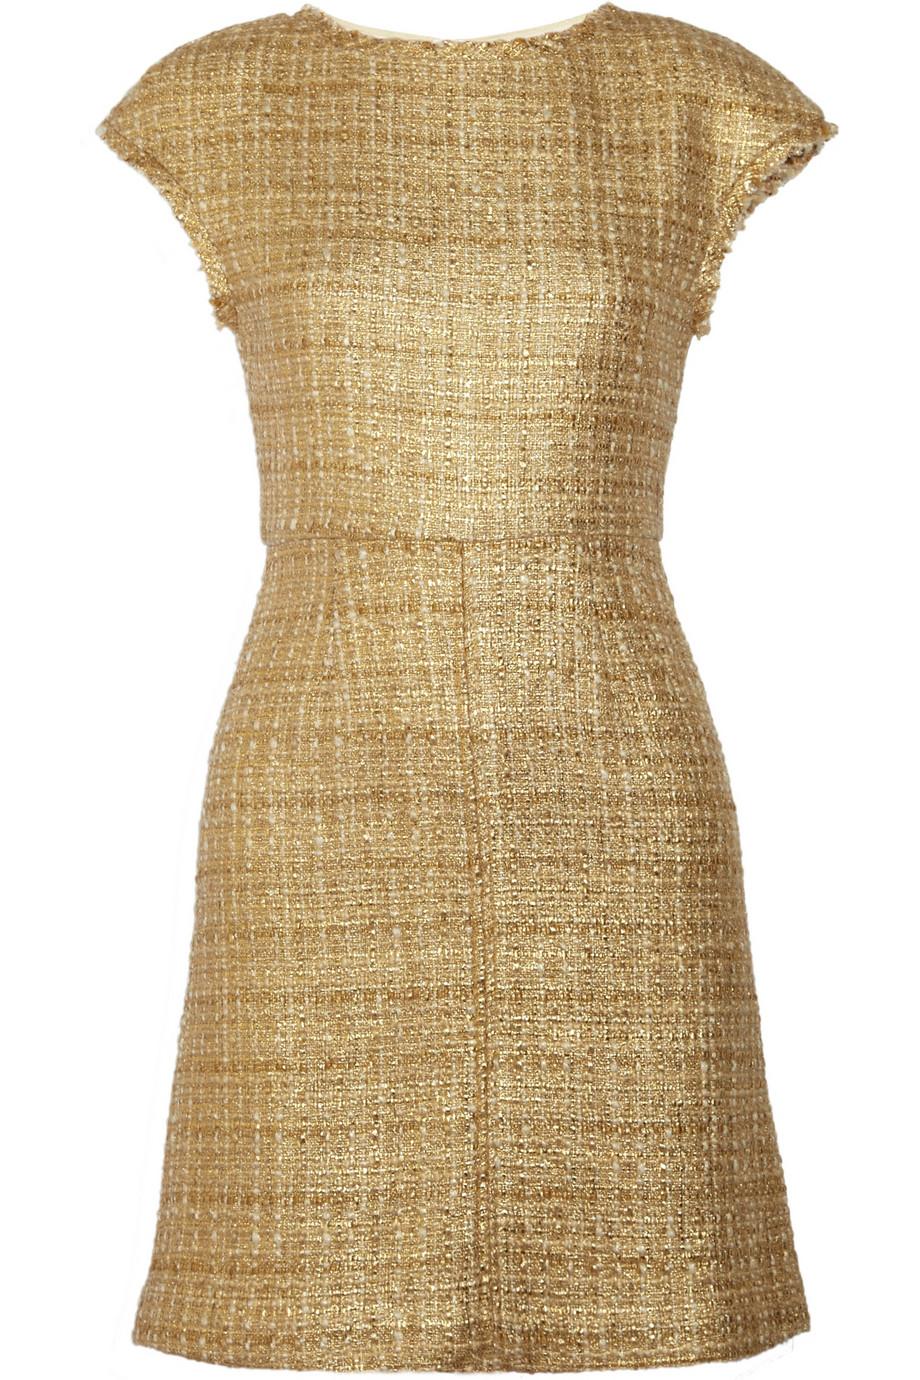 Alice + Olivia Elsie Tweed Dress in Metallic - Lyst 1853e97d6